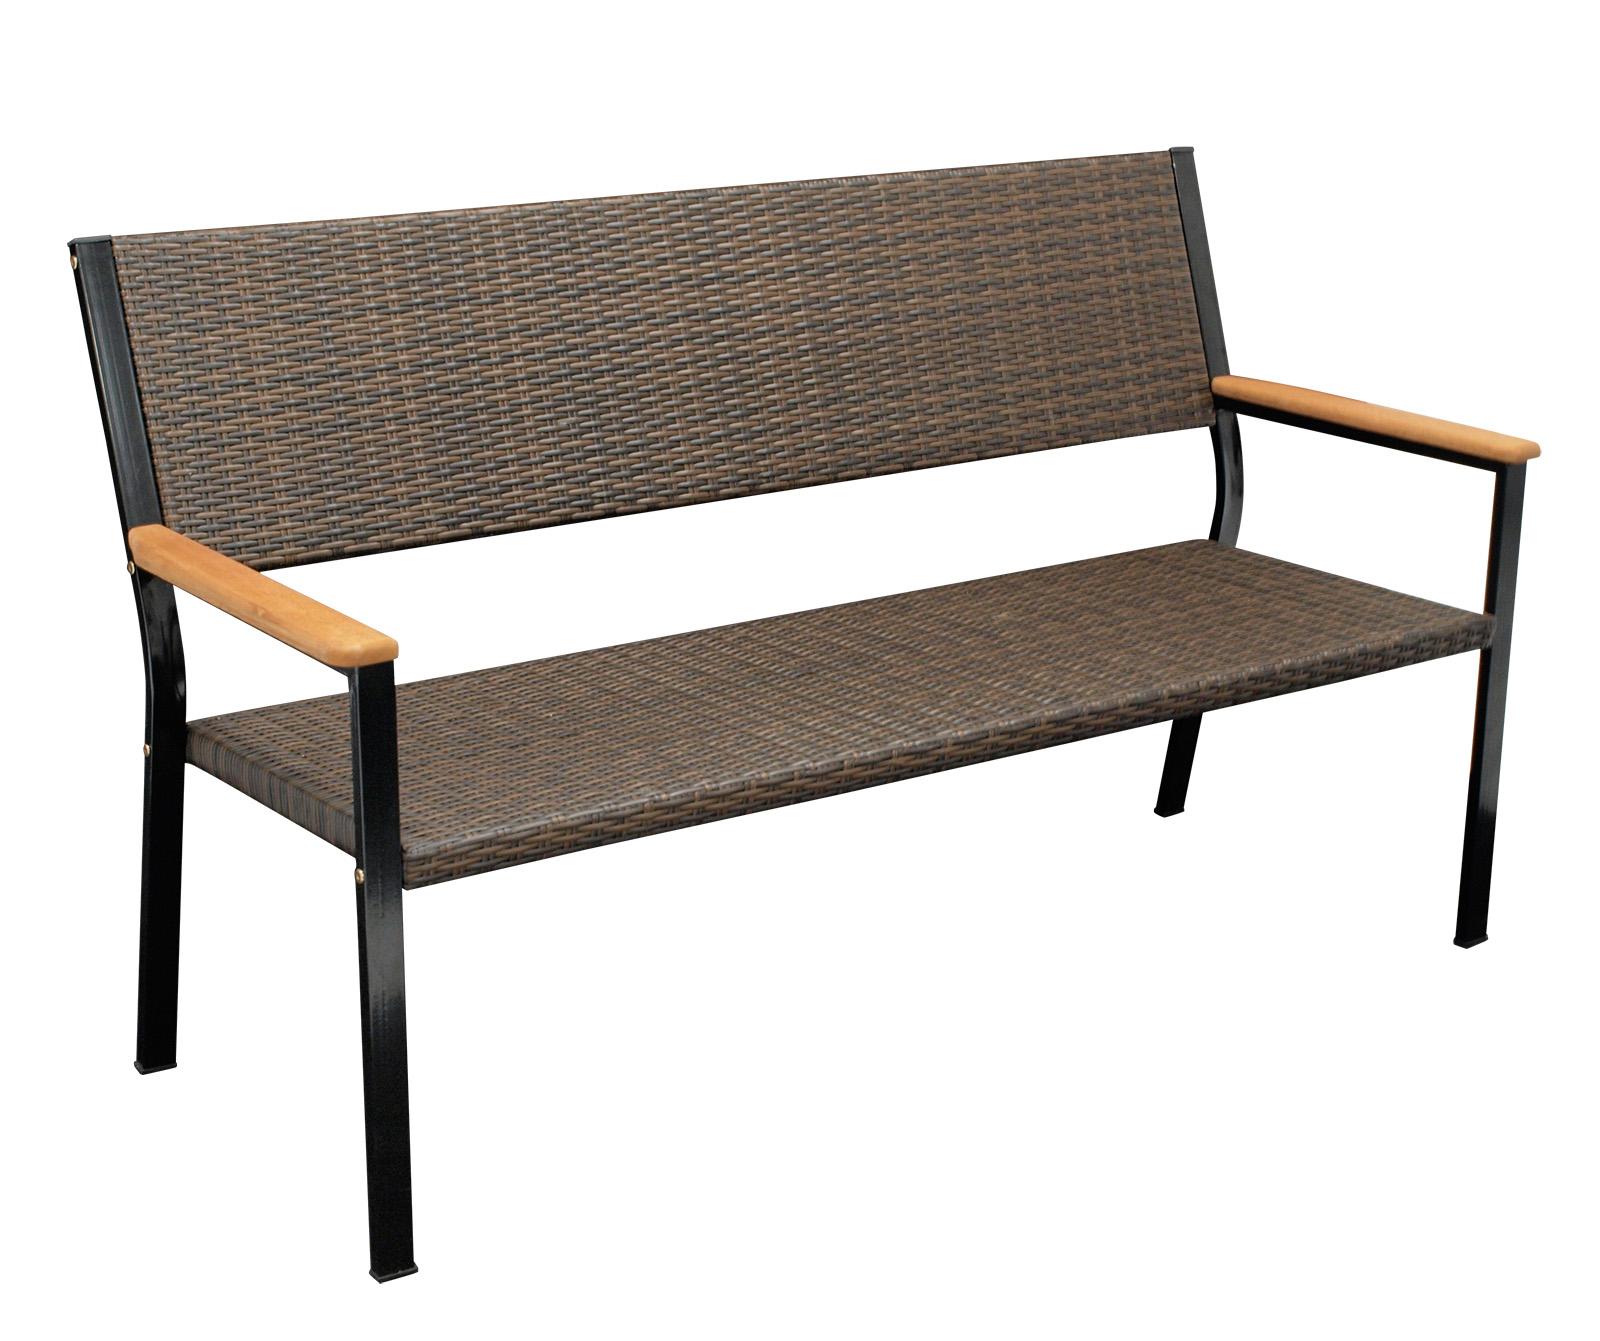 gartenbank parkbank gartenm bel bank sitzbank clifton 3 sitzer rattan braun ebay. Black Bedroom Furniture Sets. Home Design Ideas